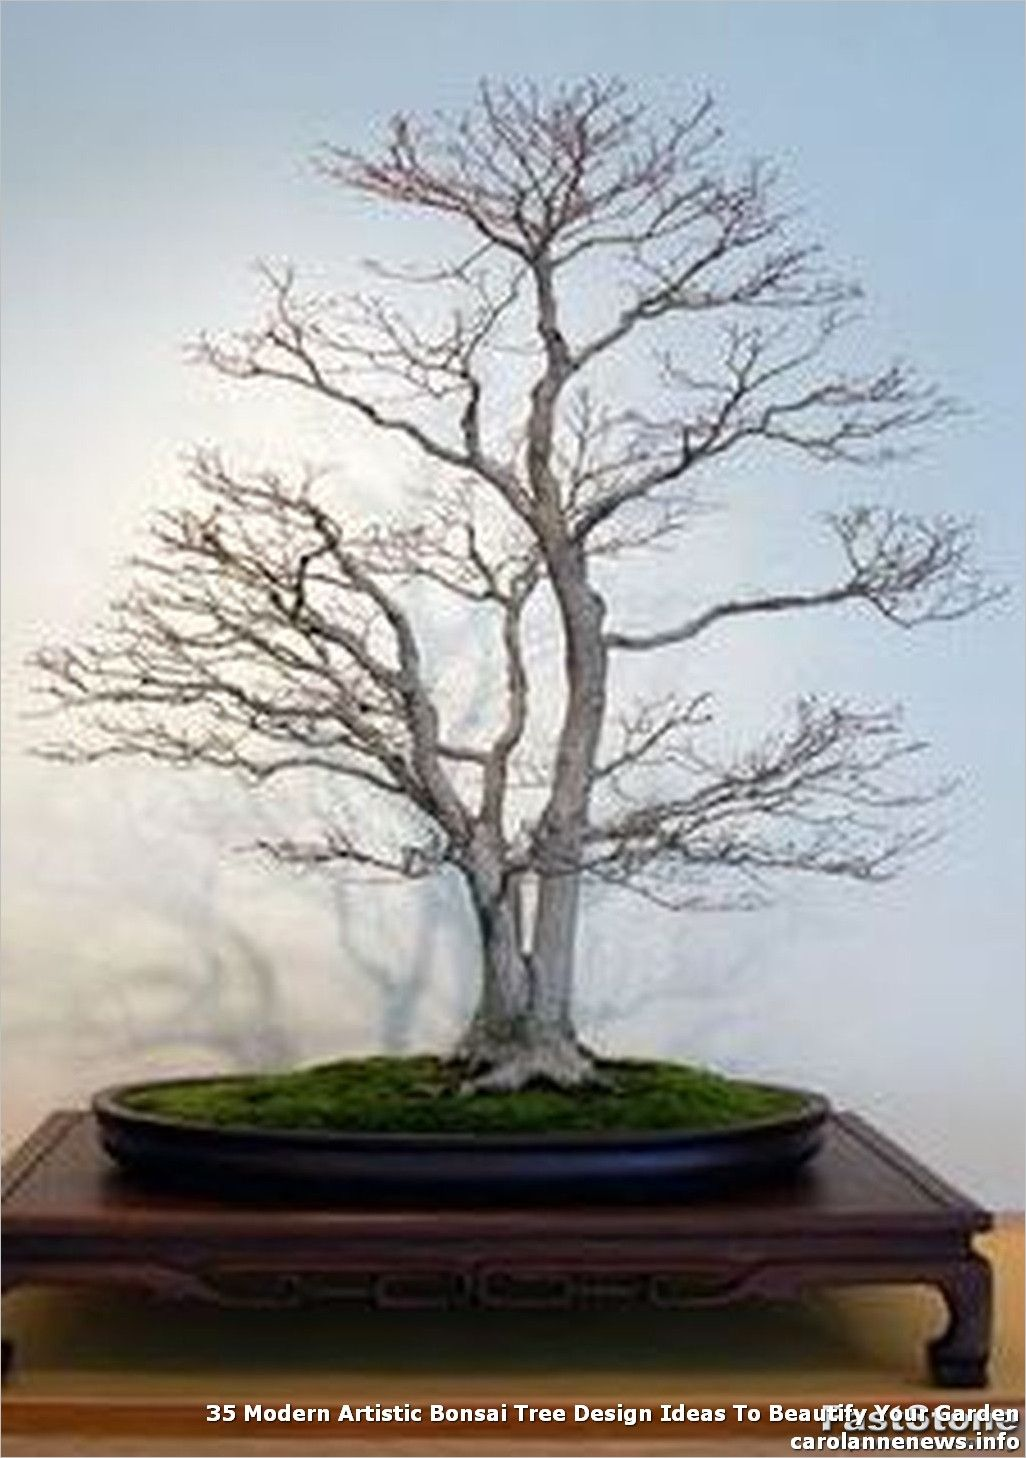 35 Modern Artistic Bonsai Tree Design Ideas To